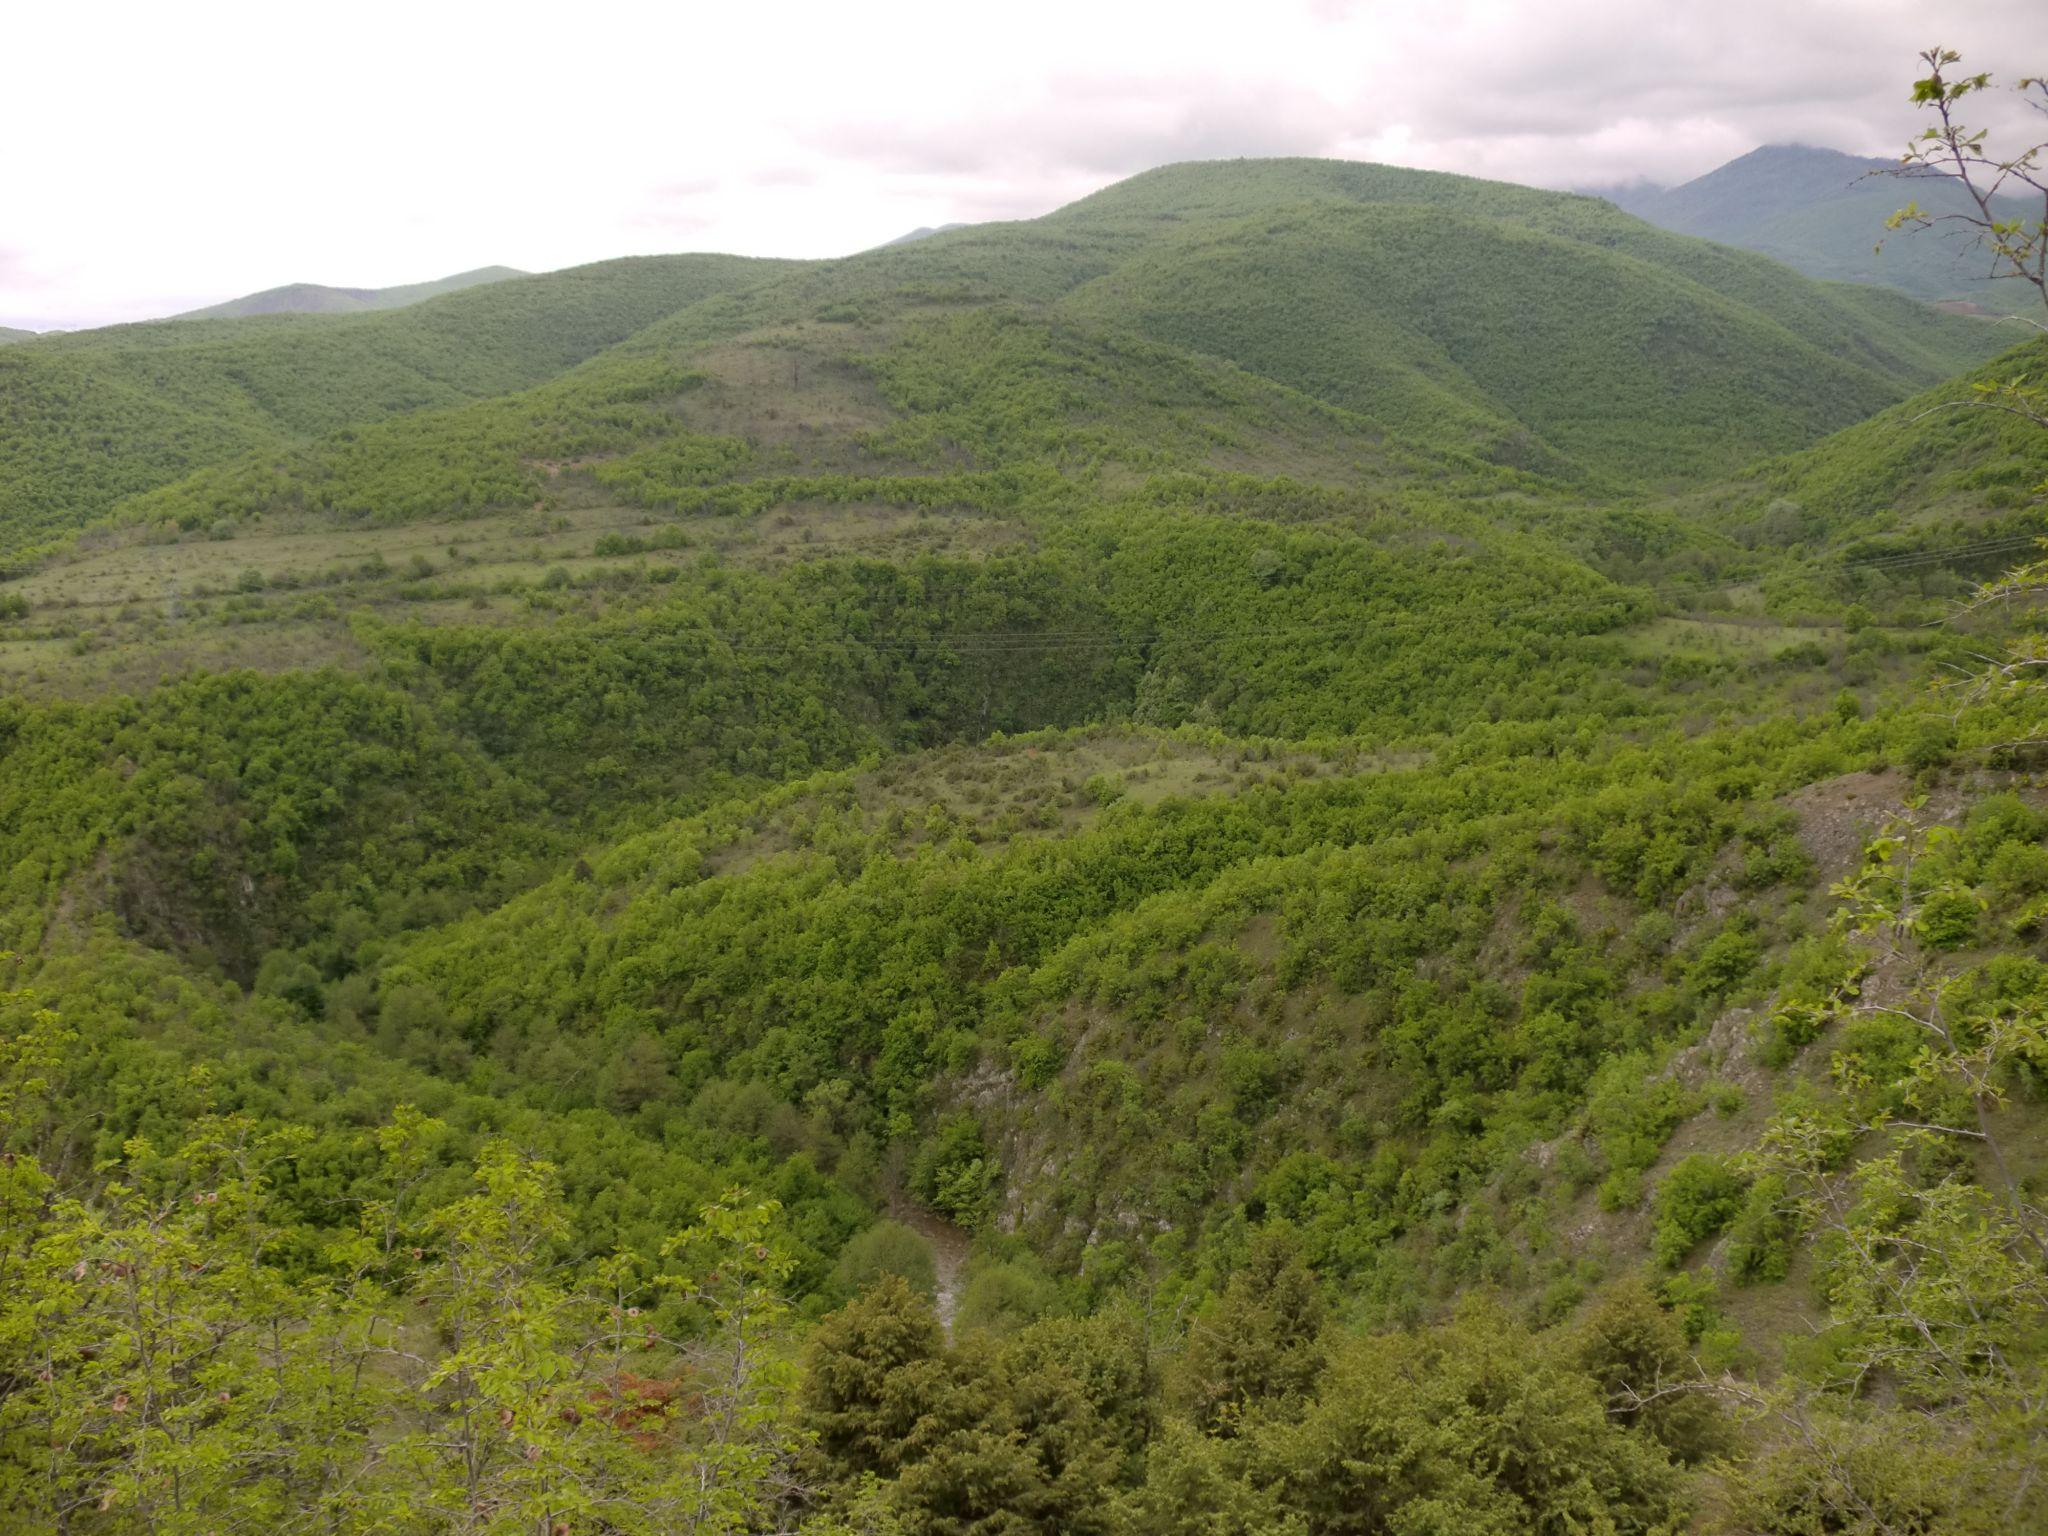 CIMG4407 - Macedonian landscapes